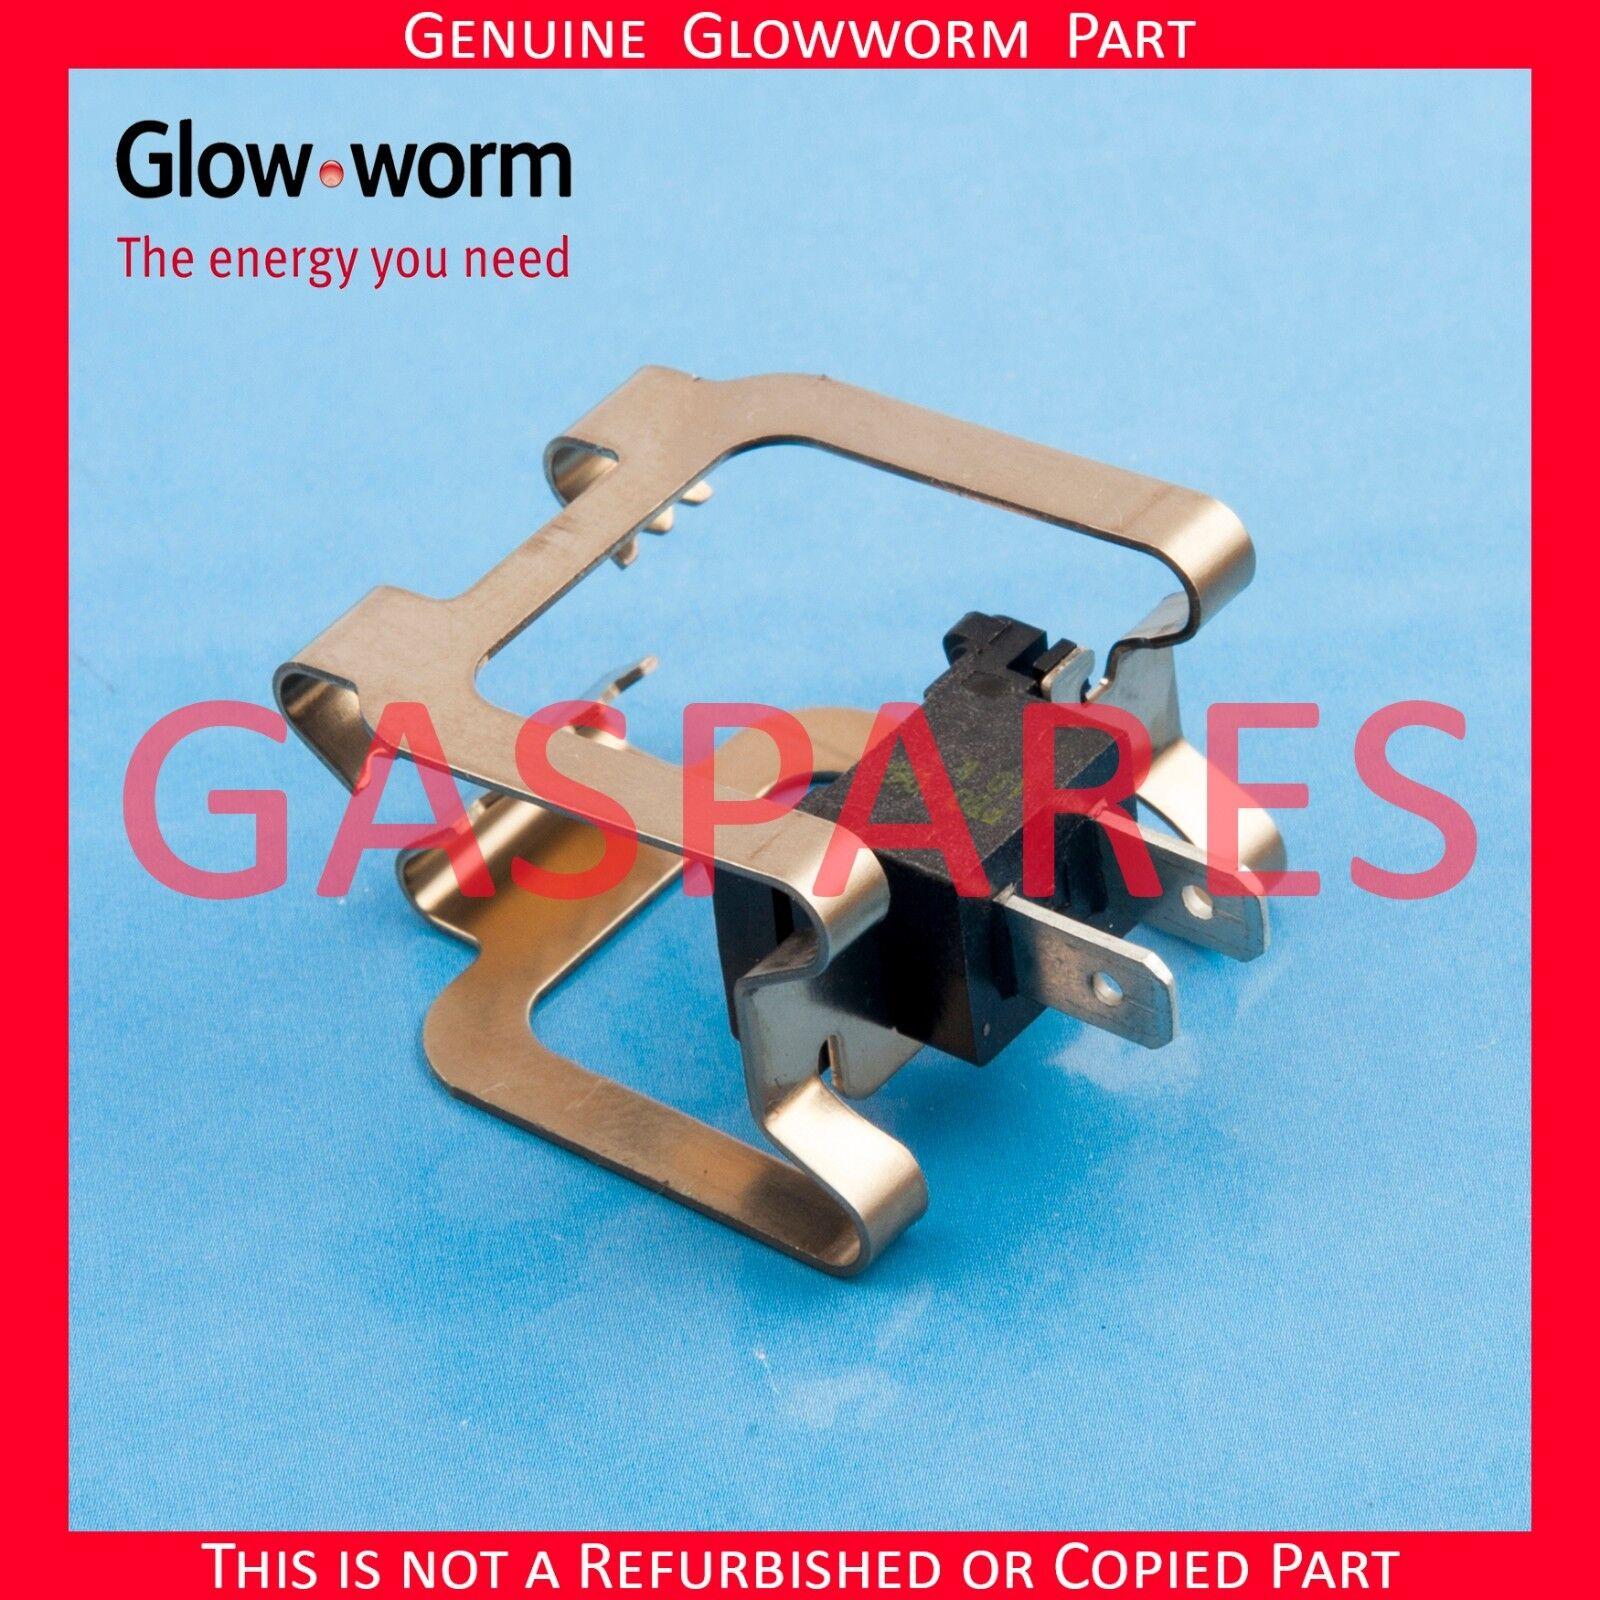 Glowworm Sustain 12 15 18 R Boiler Temperature Limiter Sensor ...